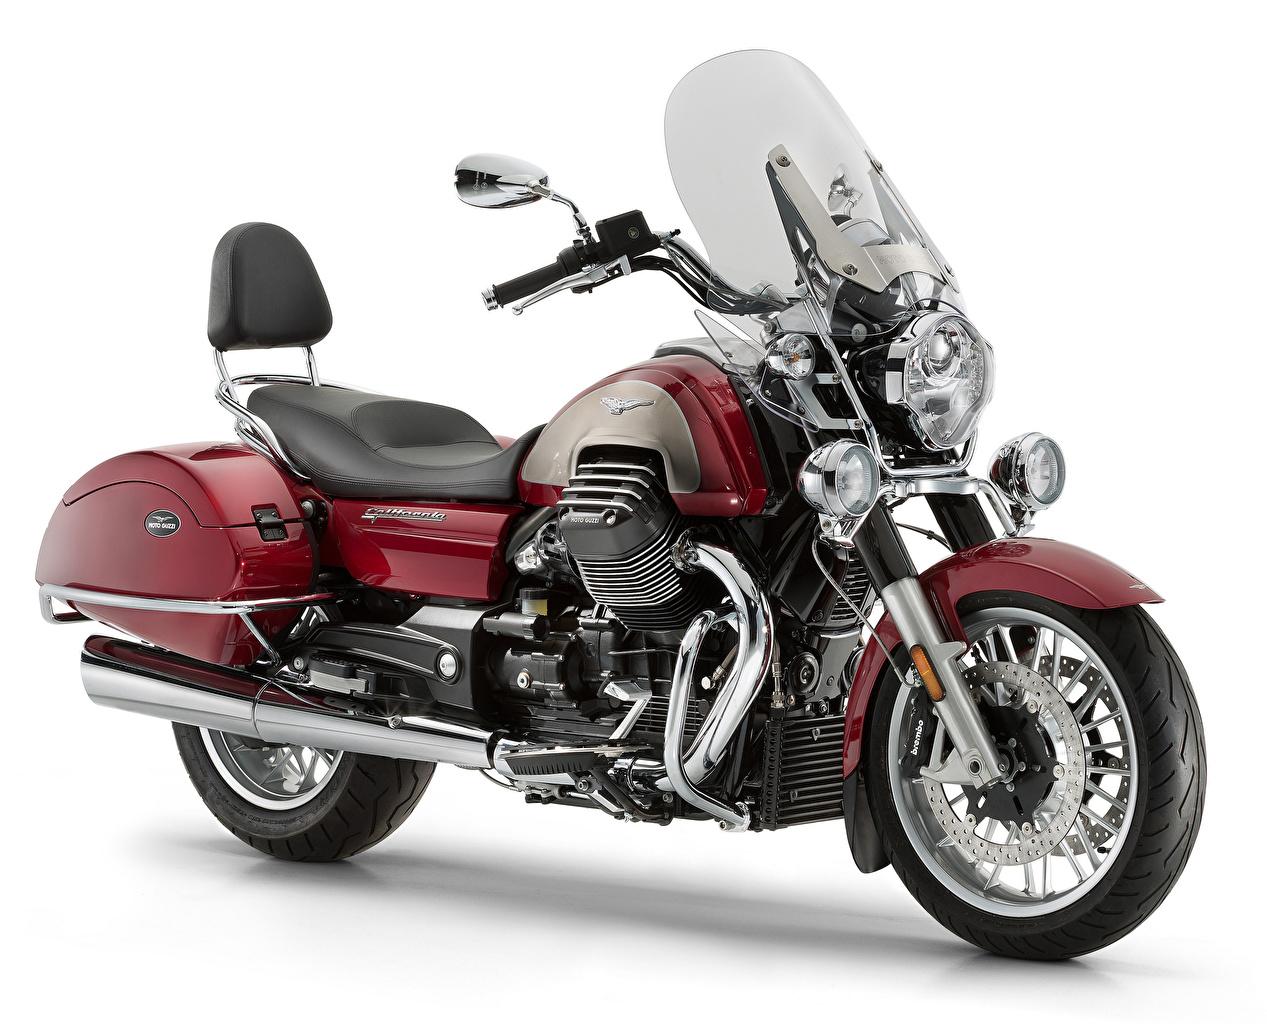 Wallpaper 2012-21 Moto Guzzi California 1400 Touring SE maroon Motorcycles White background dark red burgundy Wine color motorcycle